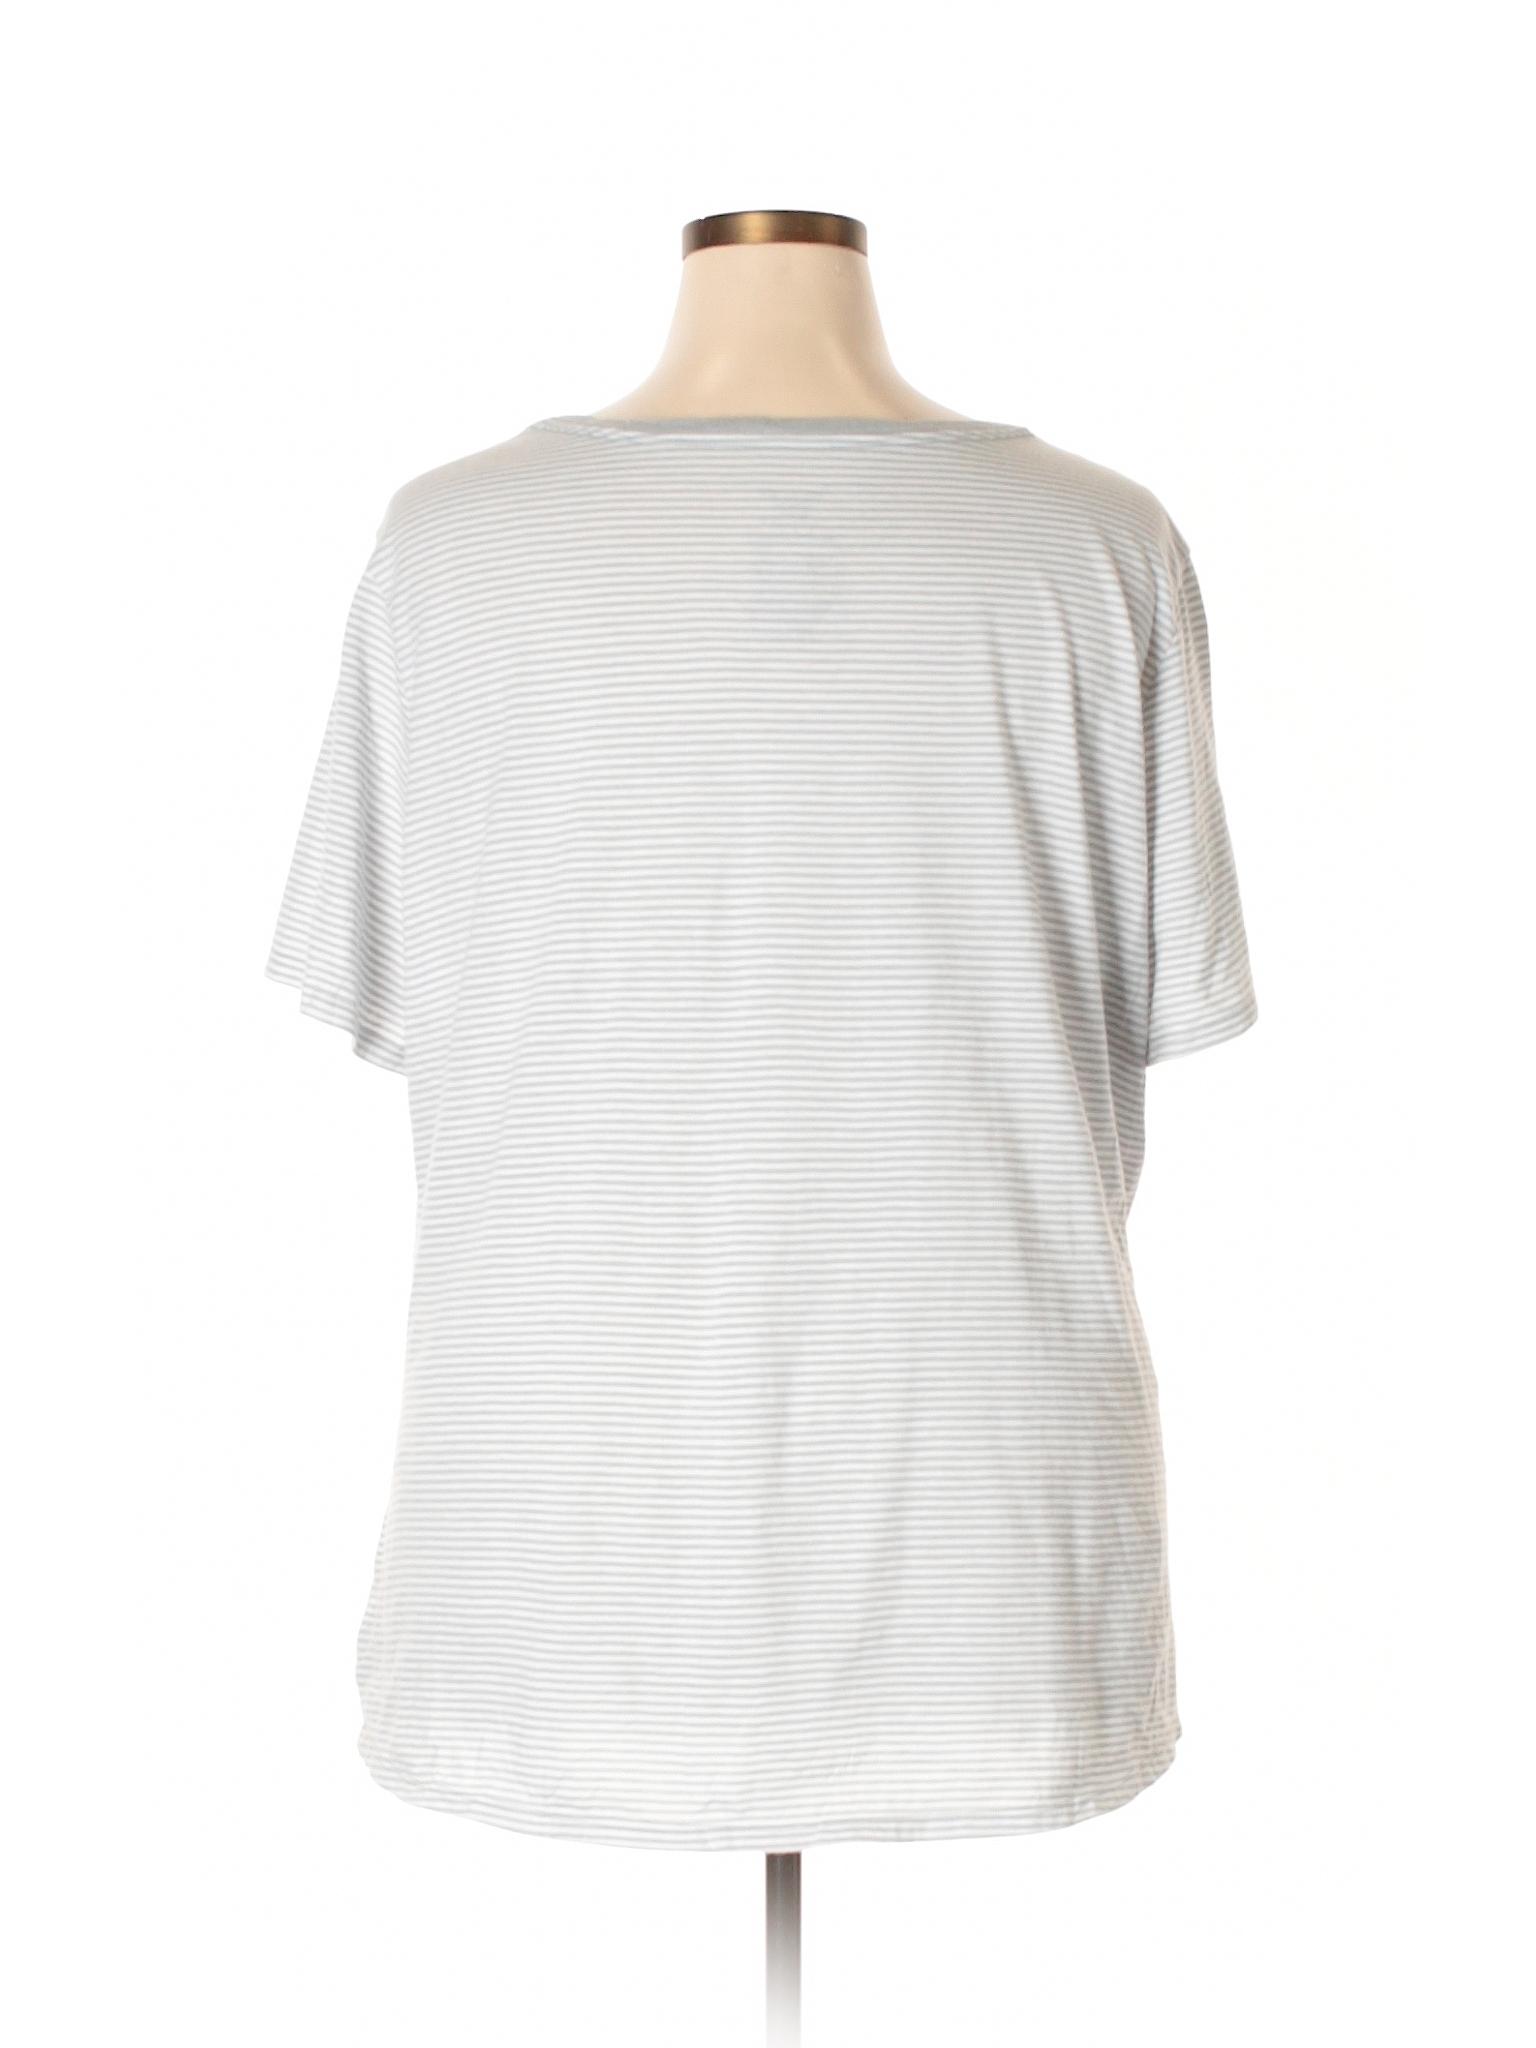 ecad0f63e8cb7 Faded Glory Stripes Gray Short Sleeve T-Shirt Size 4X (Plus) - 25 ...